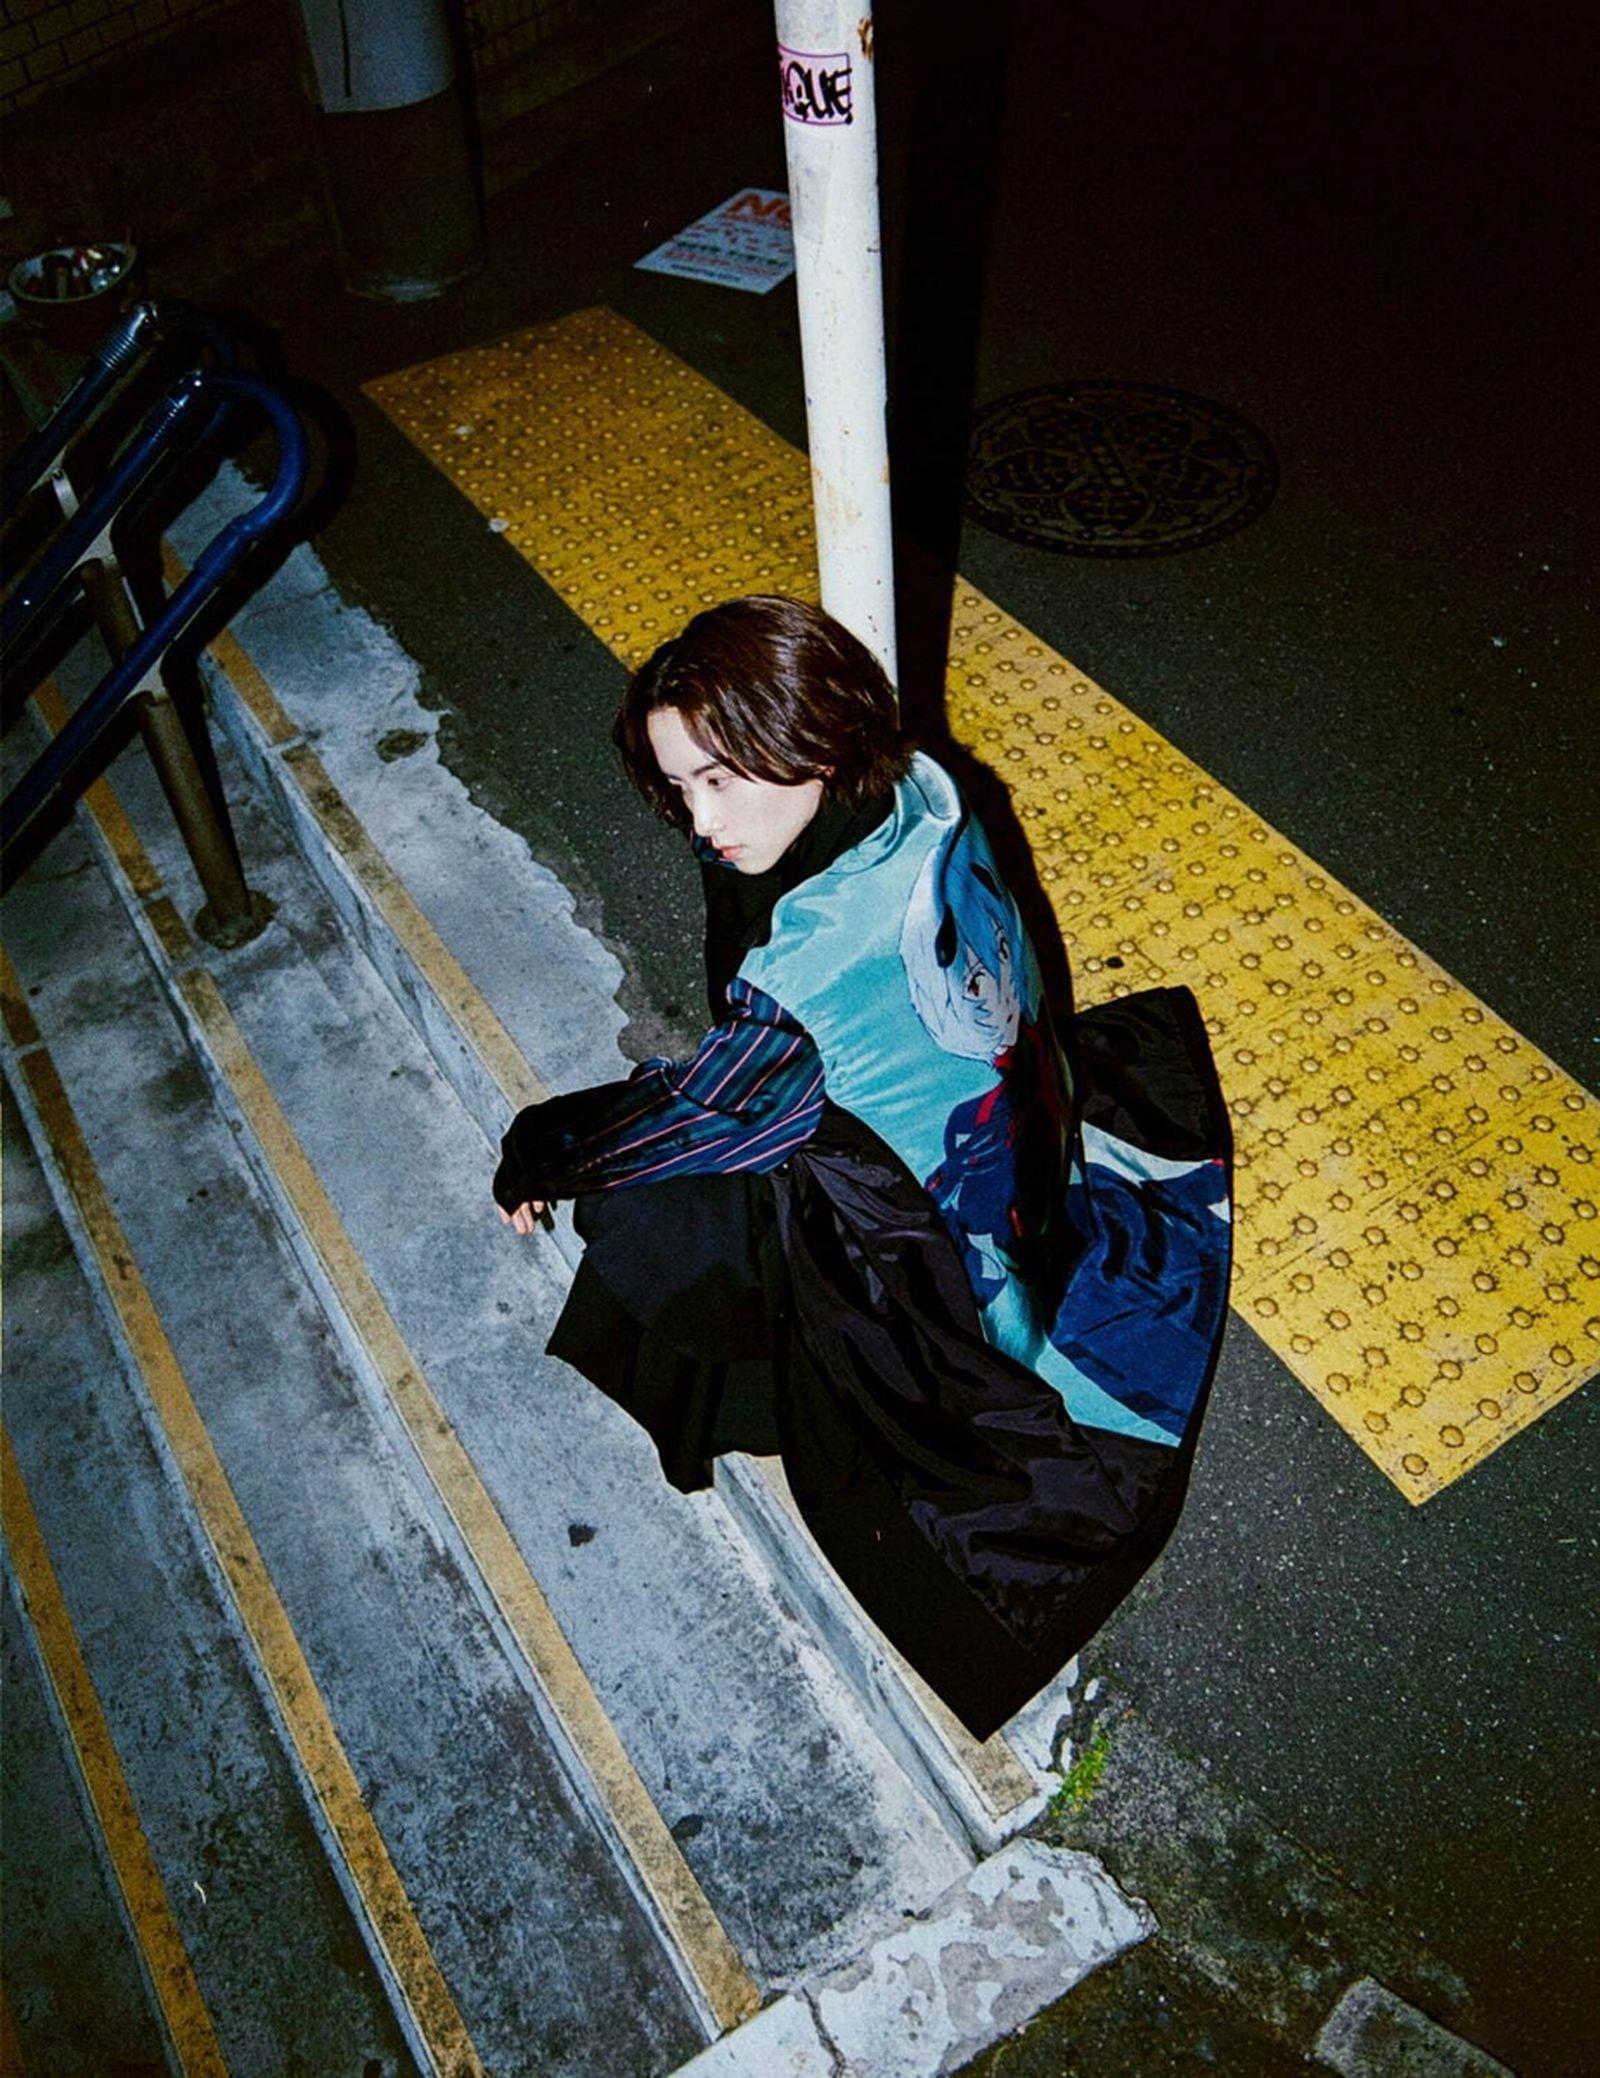 evangelion-yohji-yamamoto-ground-y-collab- (13)